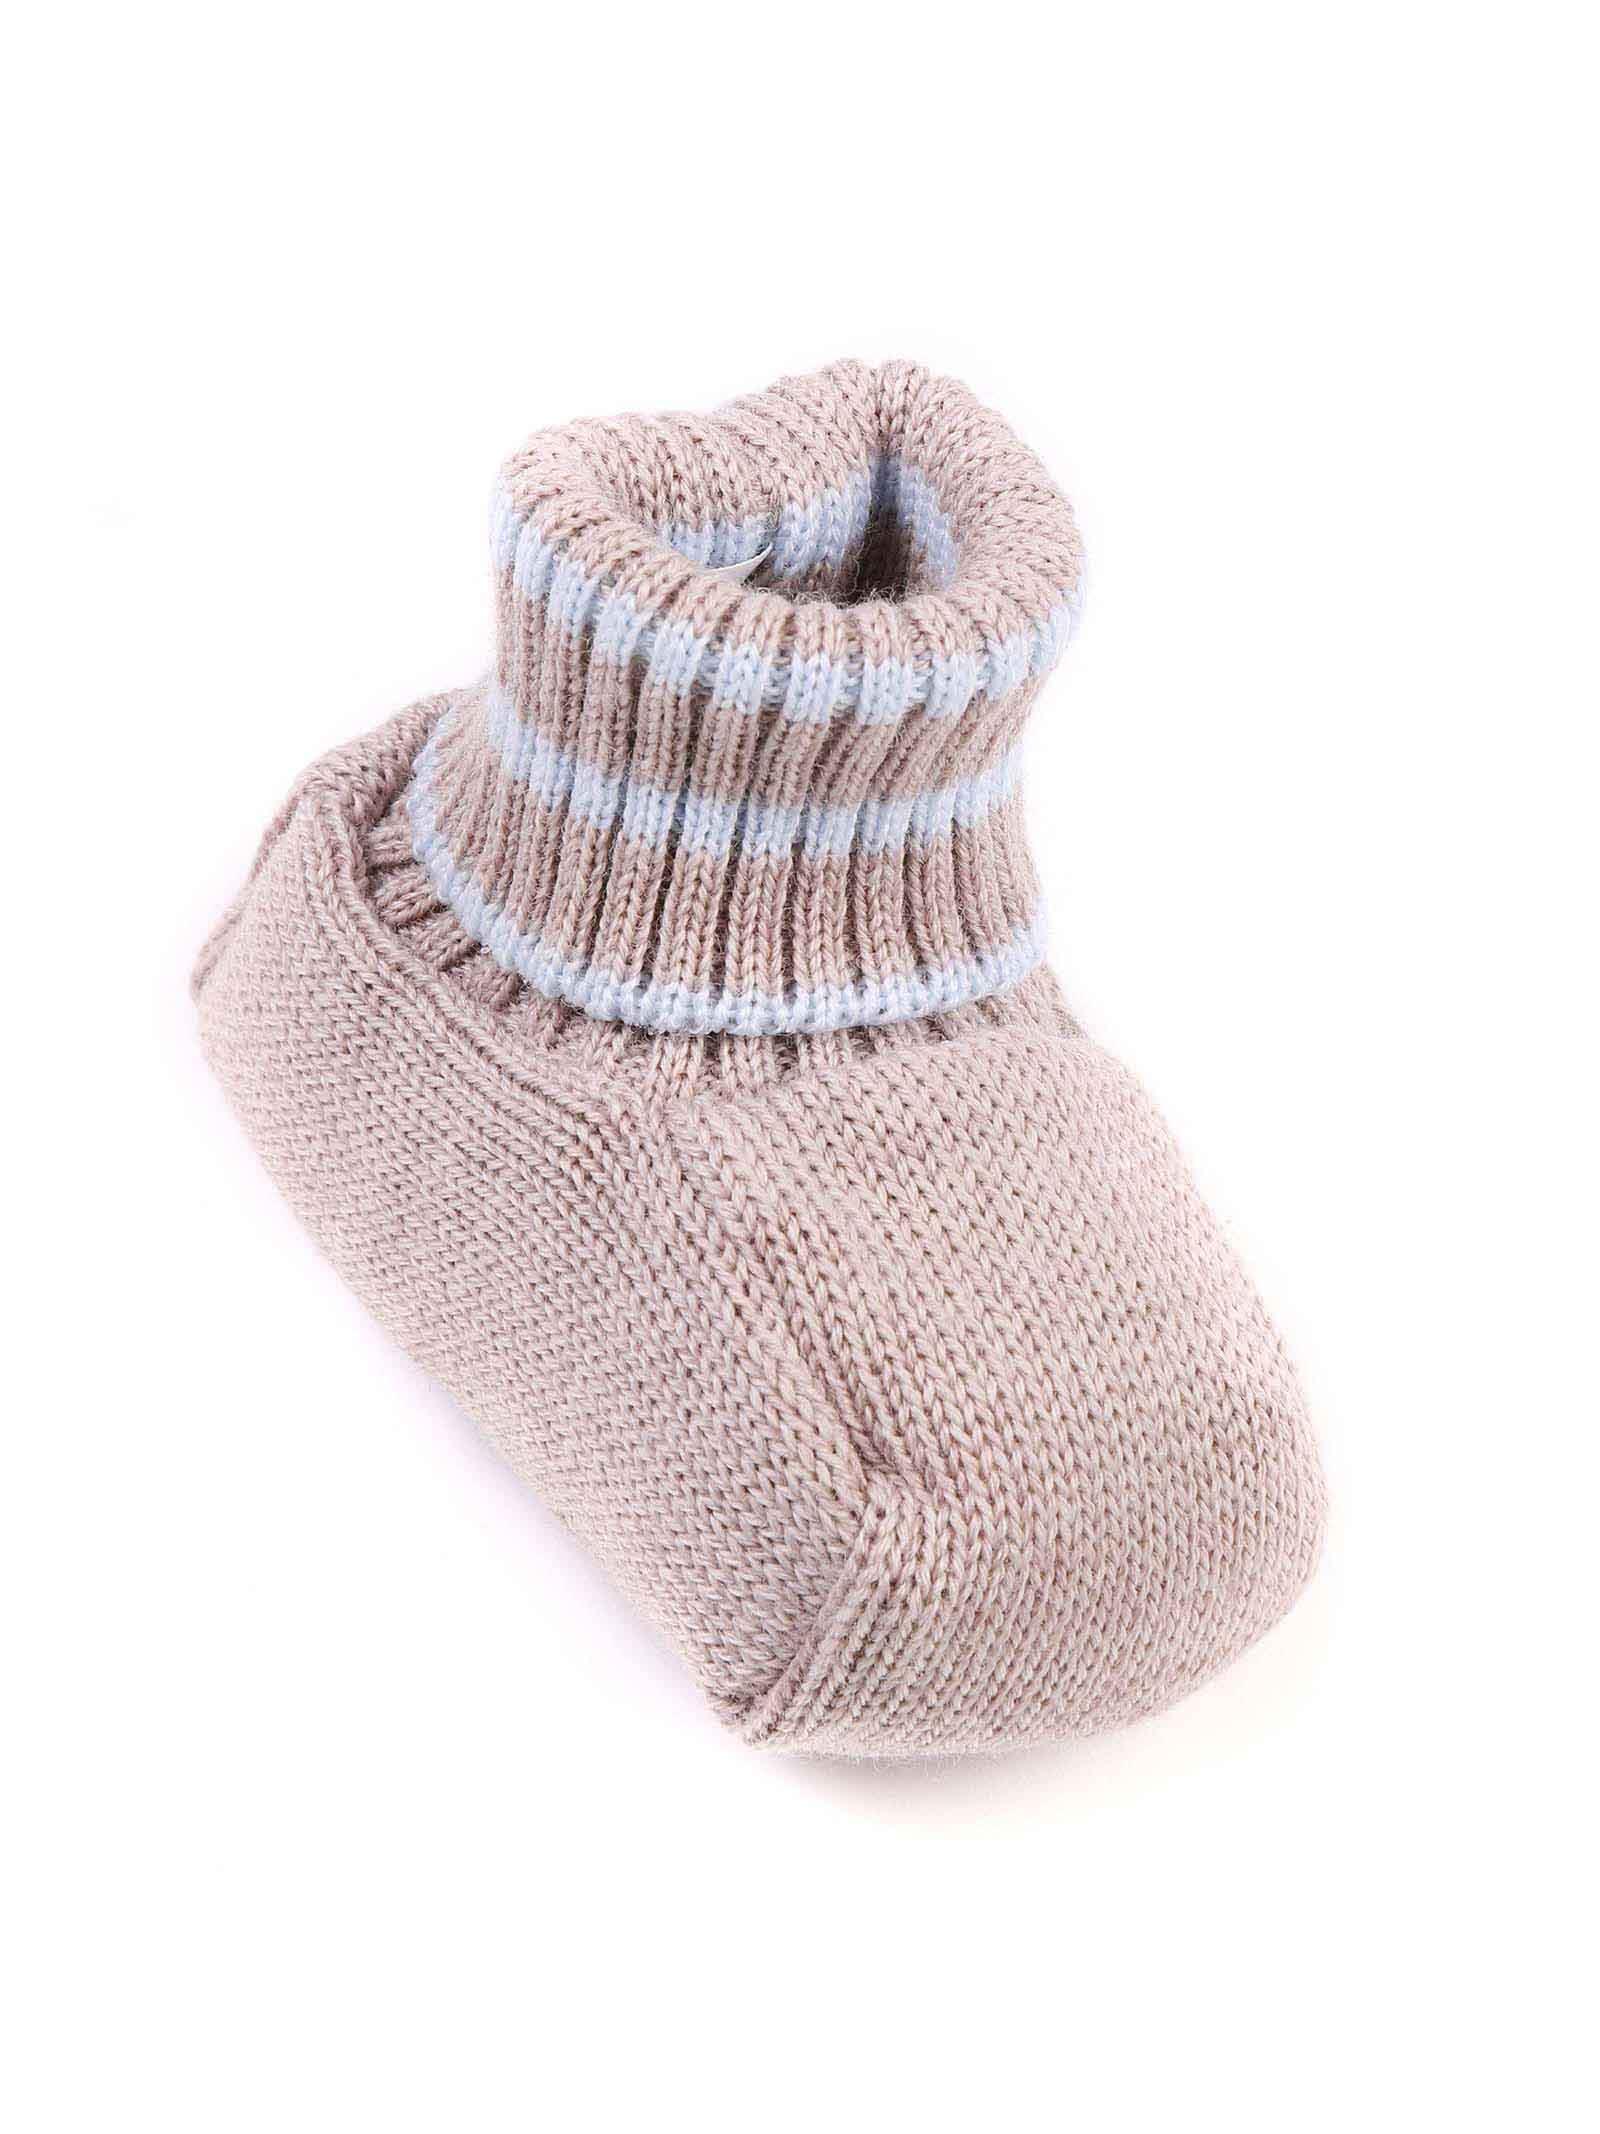 scarpina baby beige con strisce caviglia celesti MARLU | Scarpina | IP64SC384